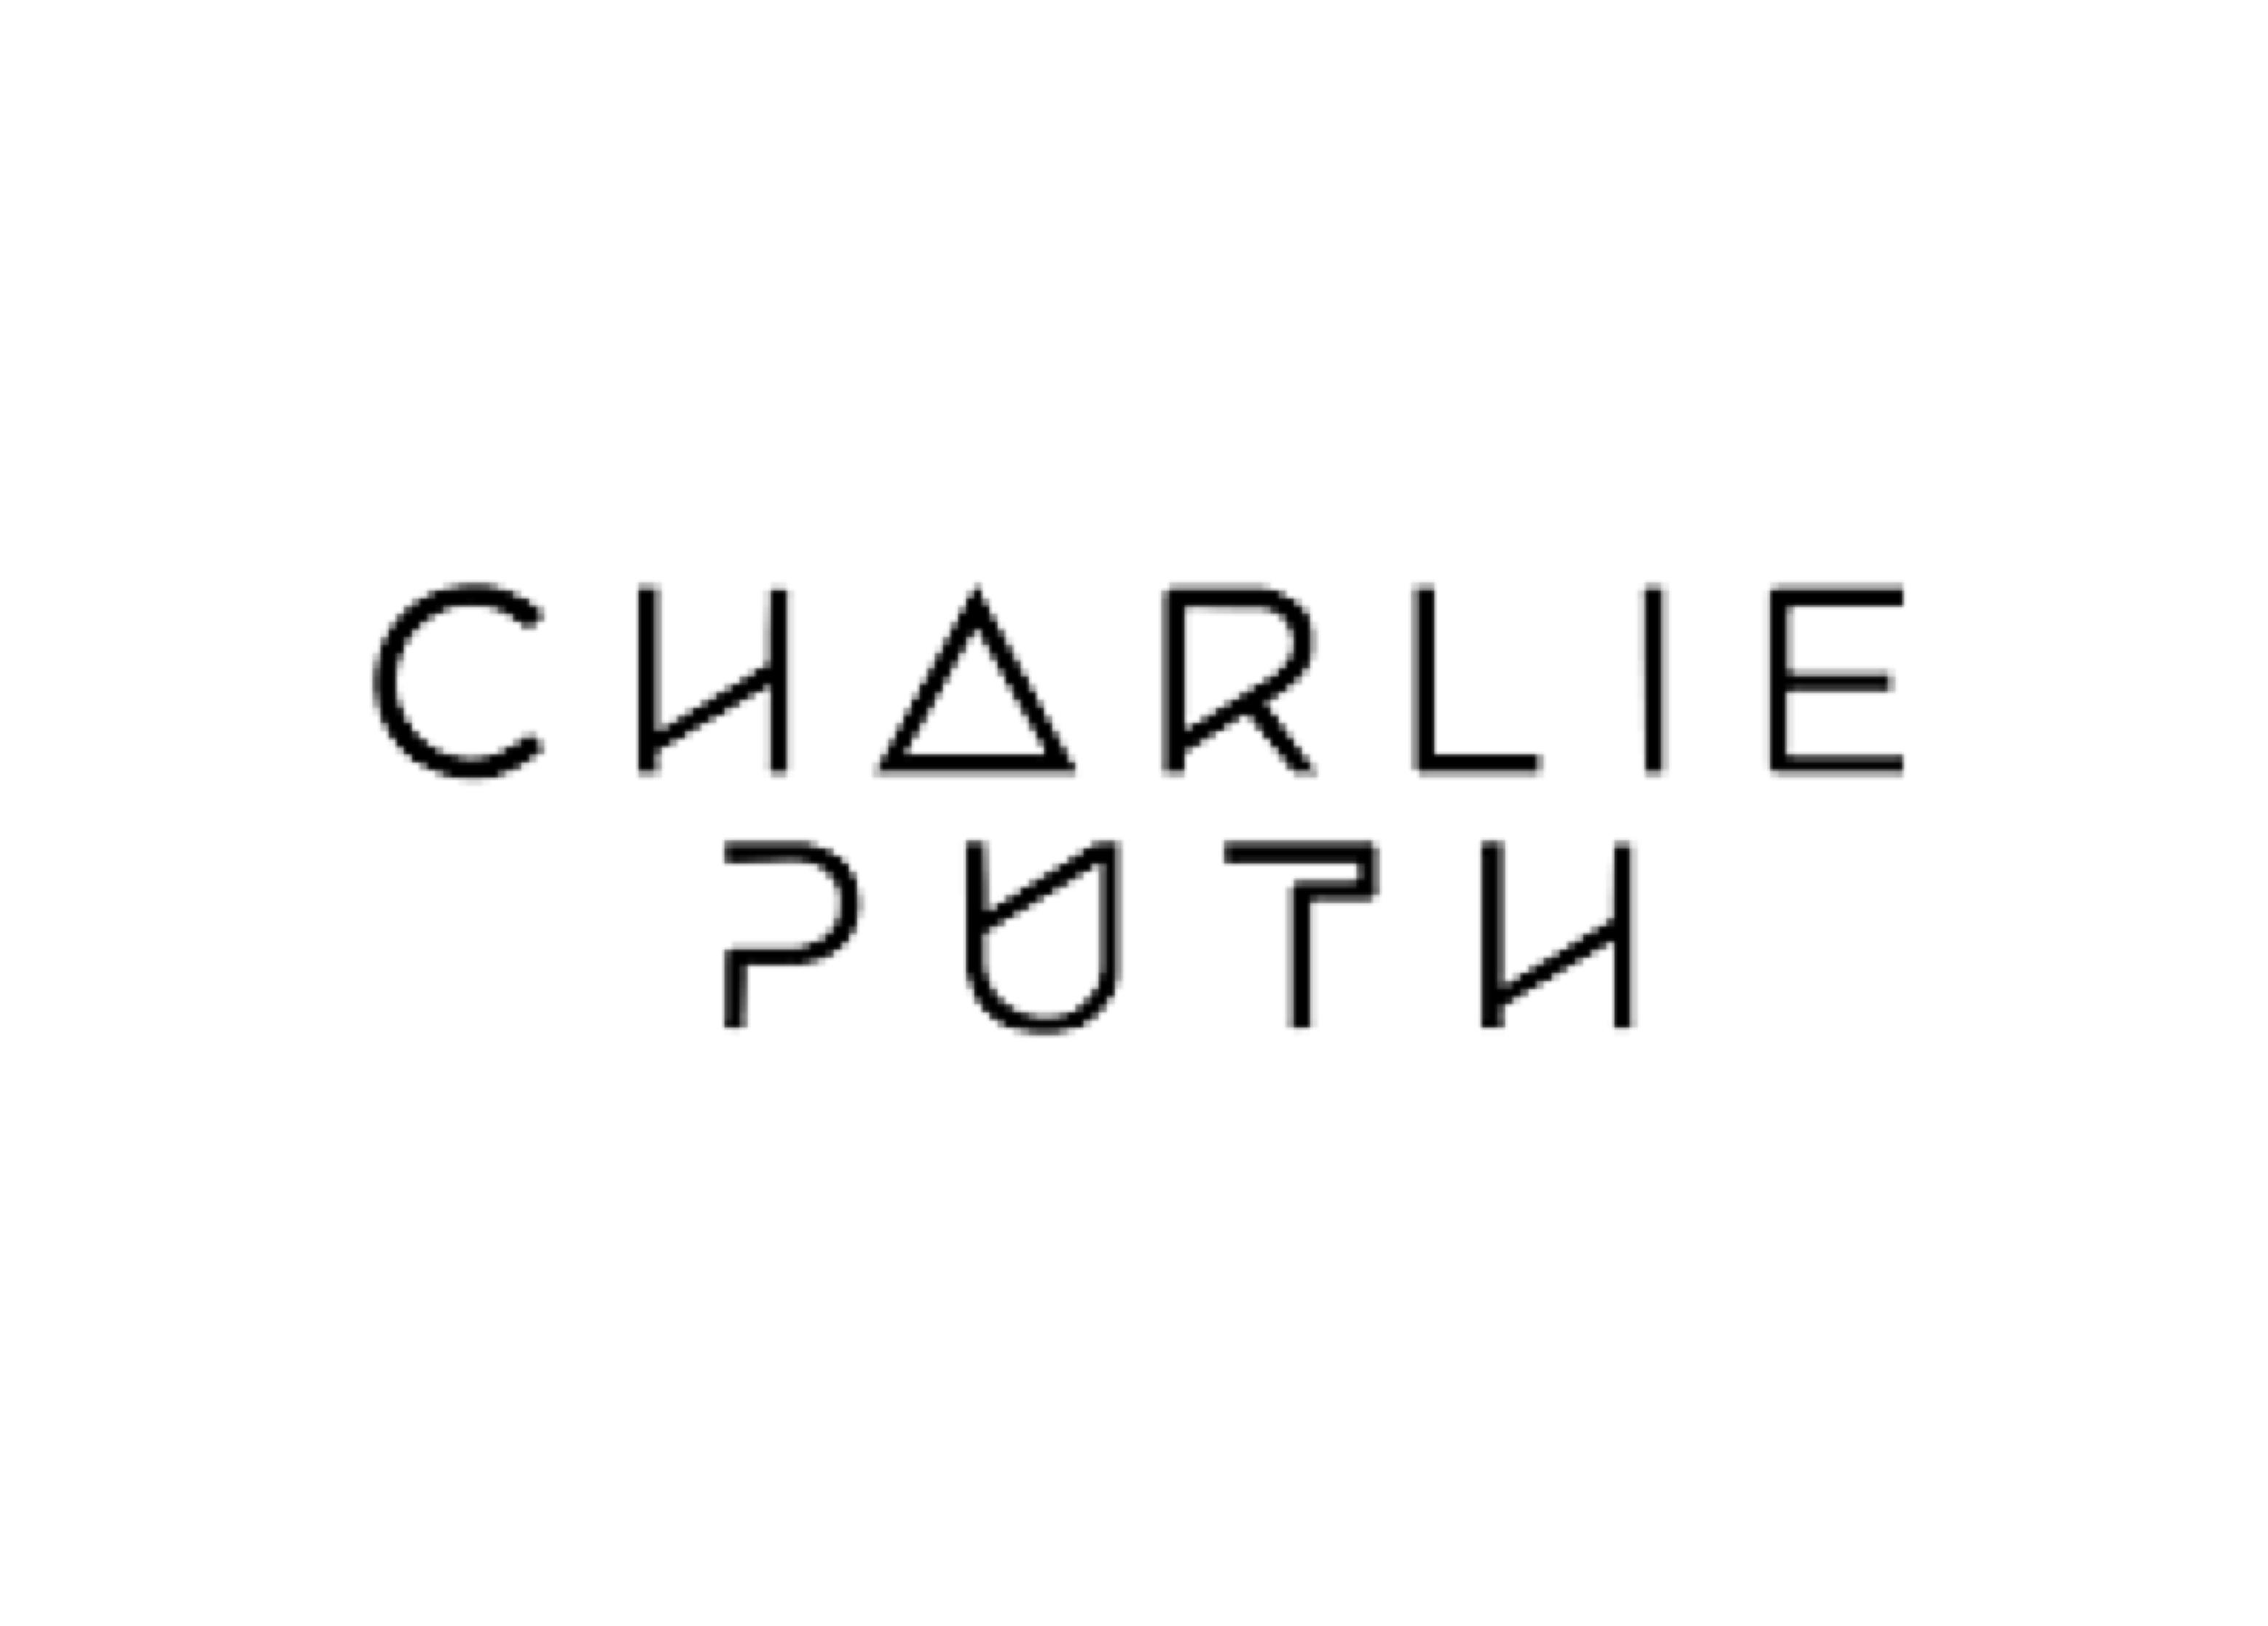 Charlie Puth Artist Logo